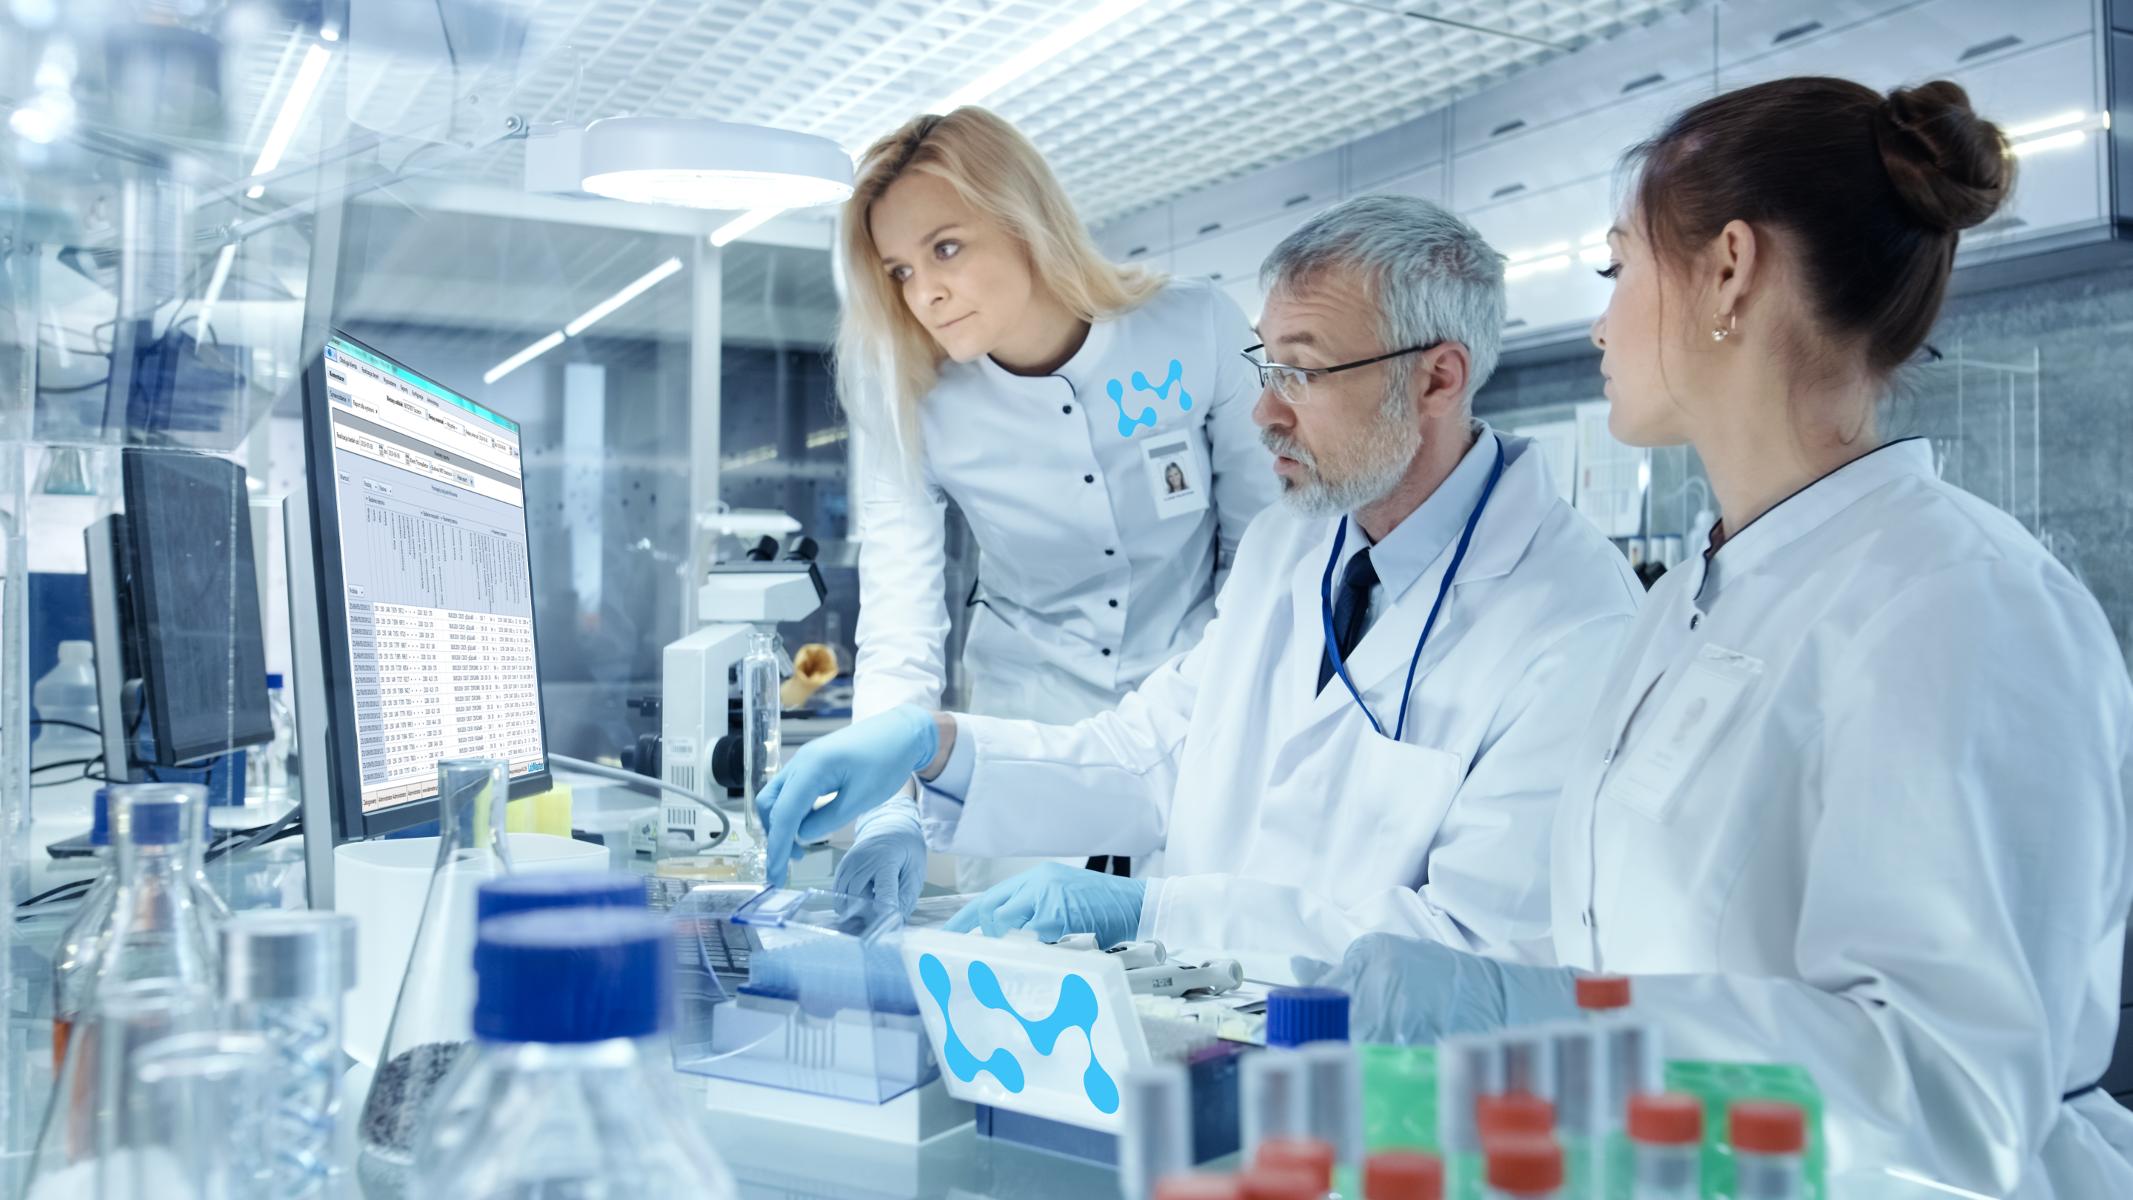 LabMaster - mistrzowski asystent laboratorium